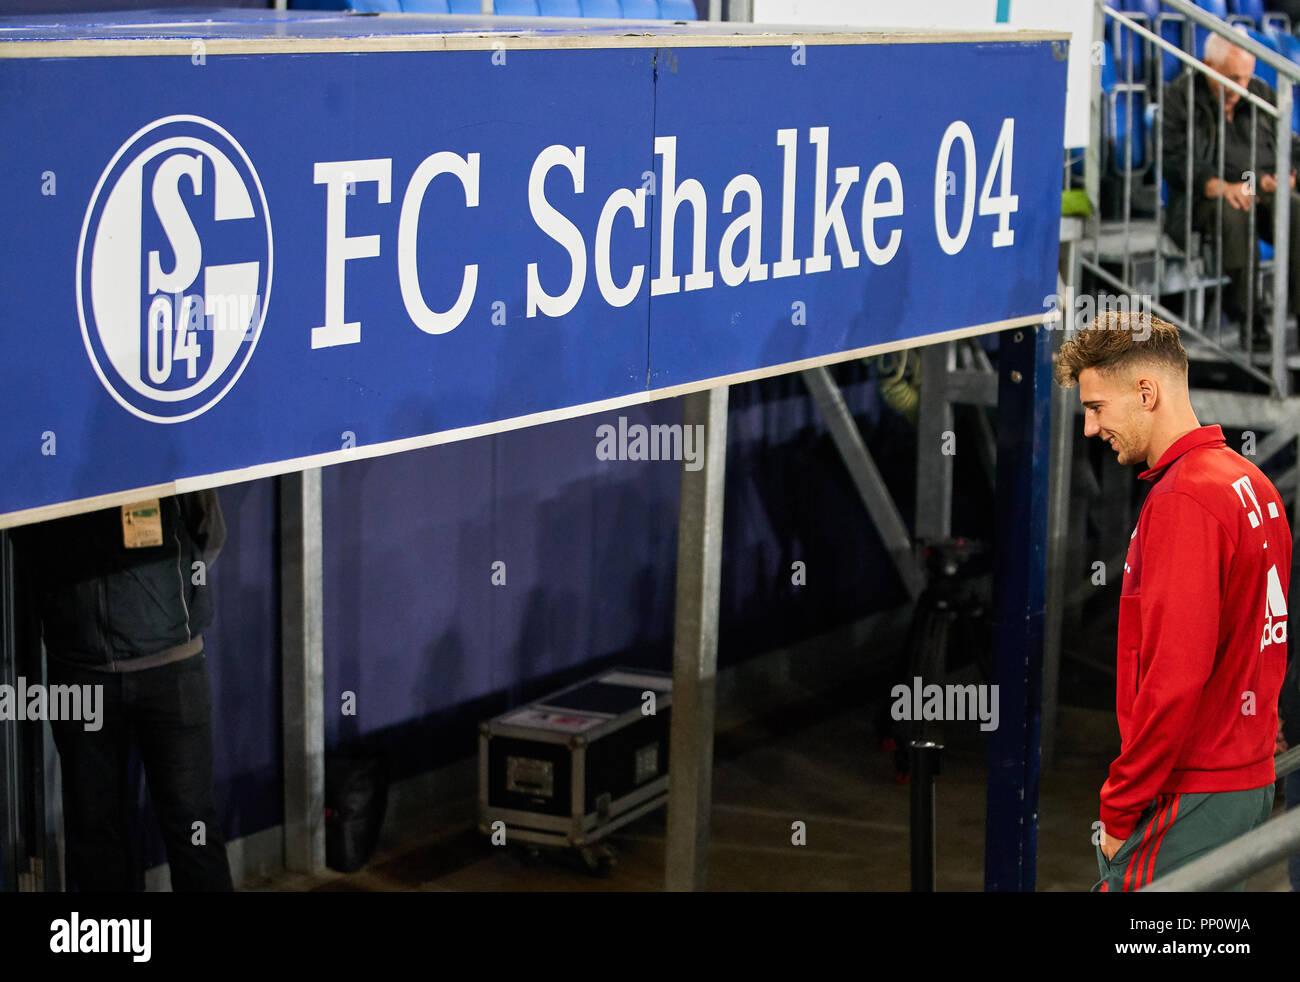 Gelsenkirchen, Germany. 22 September 2018.  Leon GORETZKA, FCB 18 back at his home club,  half-size, portrait,    FC SCHALKE 04 - FC BAYERN MUNICH   - DFL REGULATIONS PROHIBIT ANY USE OF PHOTOGRAPHS as IMAGE SEQUENCES and/or QUASI-VIDEO -  1.German Soccer League , Gelsenkirchen, September 22, 2018,  Season 2018/2019, matchday 4 © Peter Schatz / Alamy Live News Stock Photo